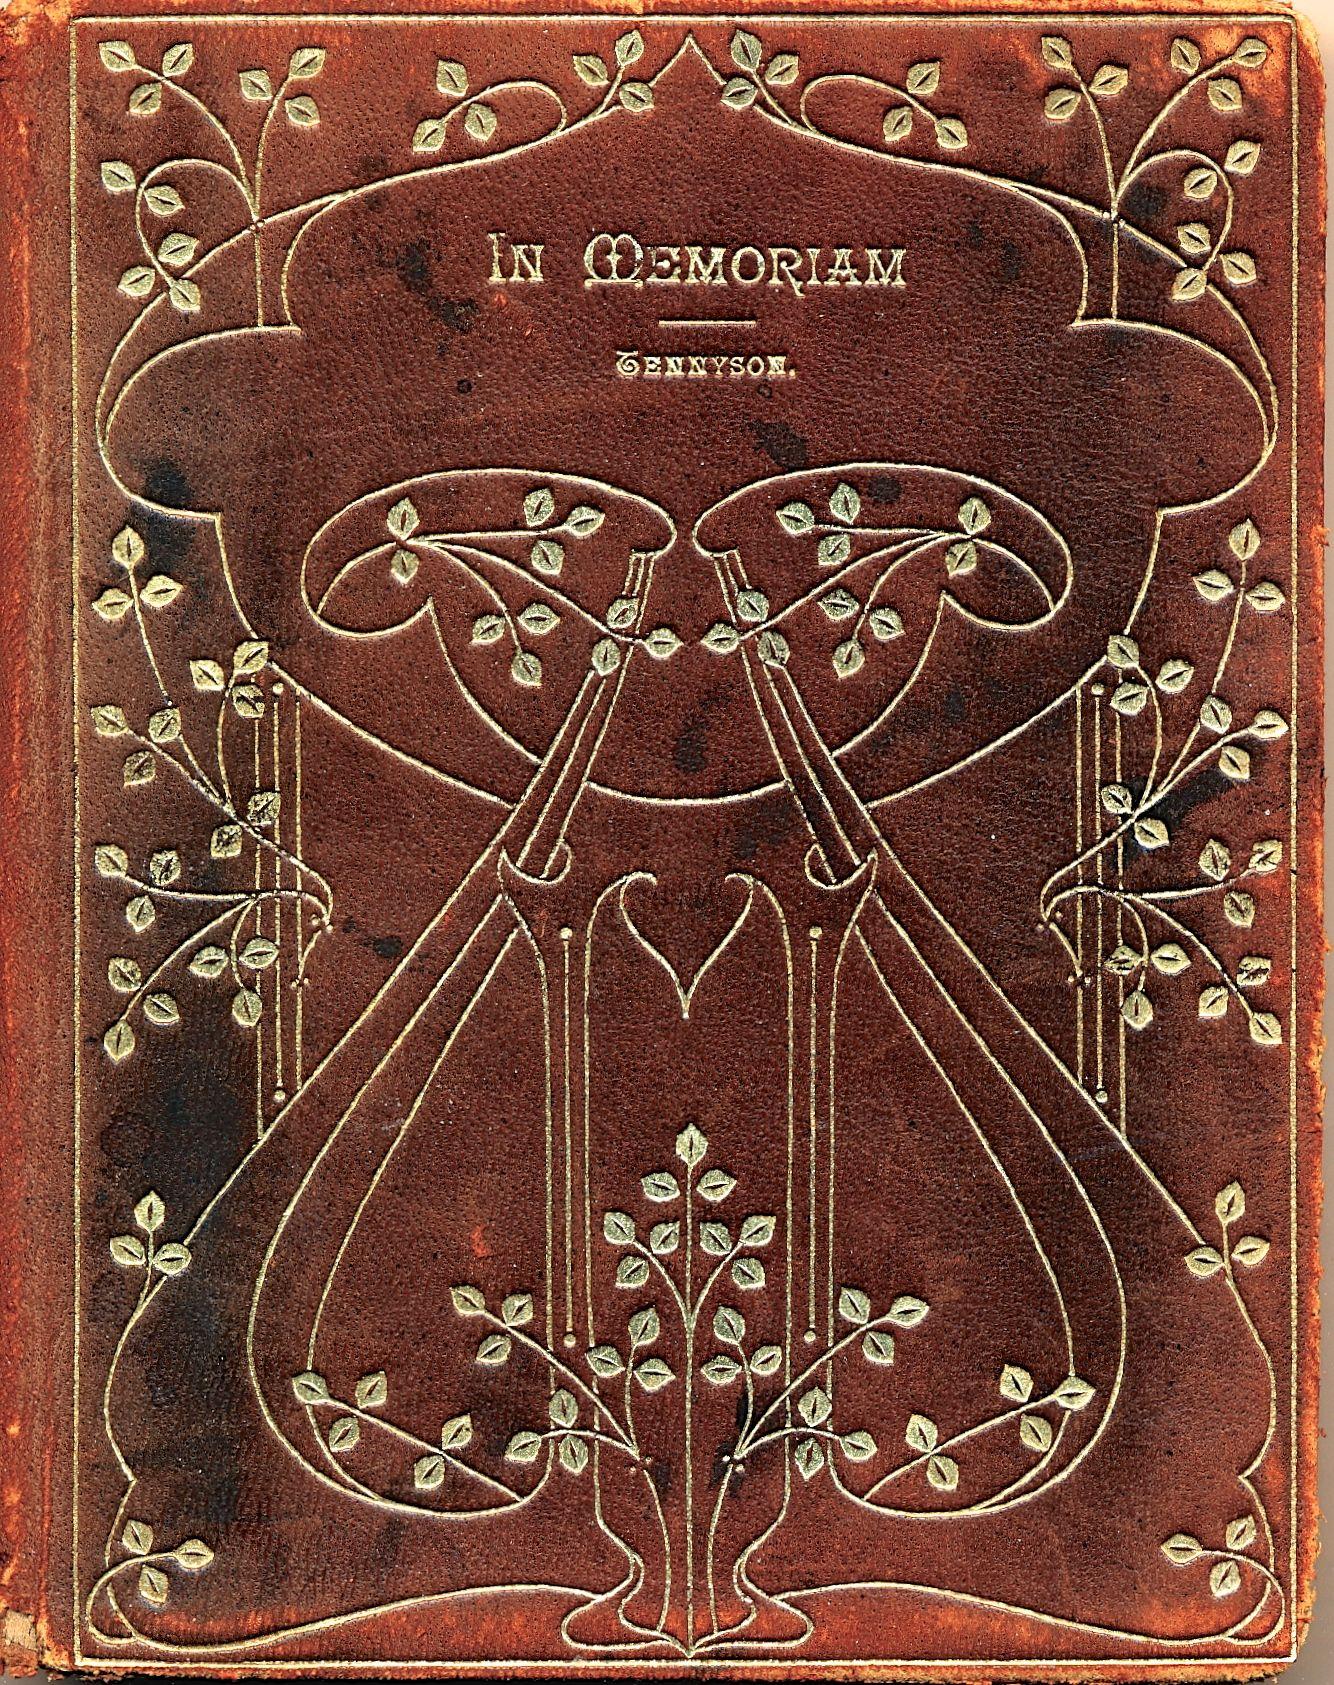 Tennyson, In Memoriam, The Astolat Press, London, 1905 ...